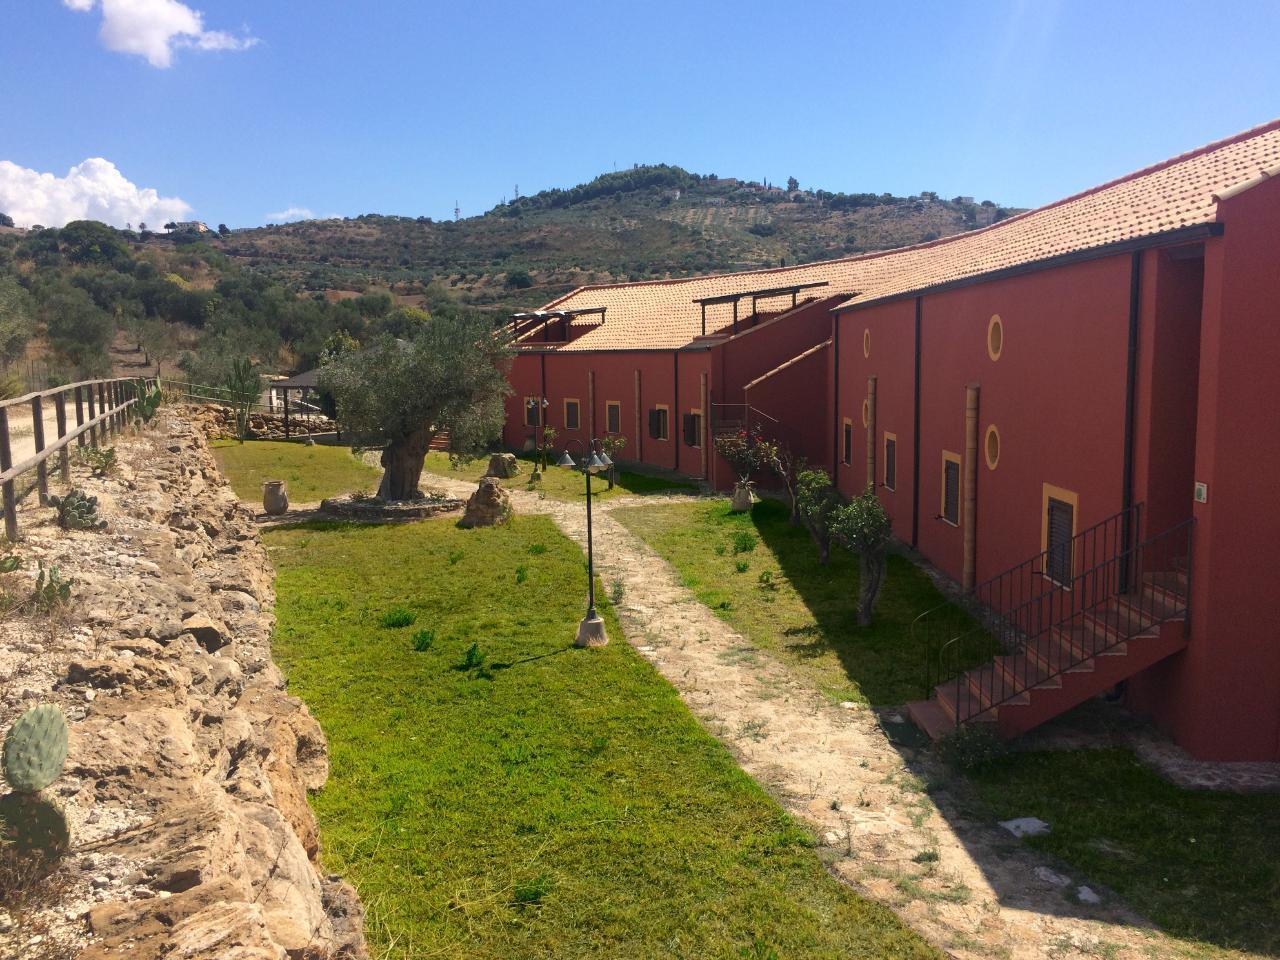 Appartement de vacances Ferienwohnungen (404150), Sciacca, Agrigento, Sicile, Italie, image 11